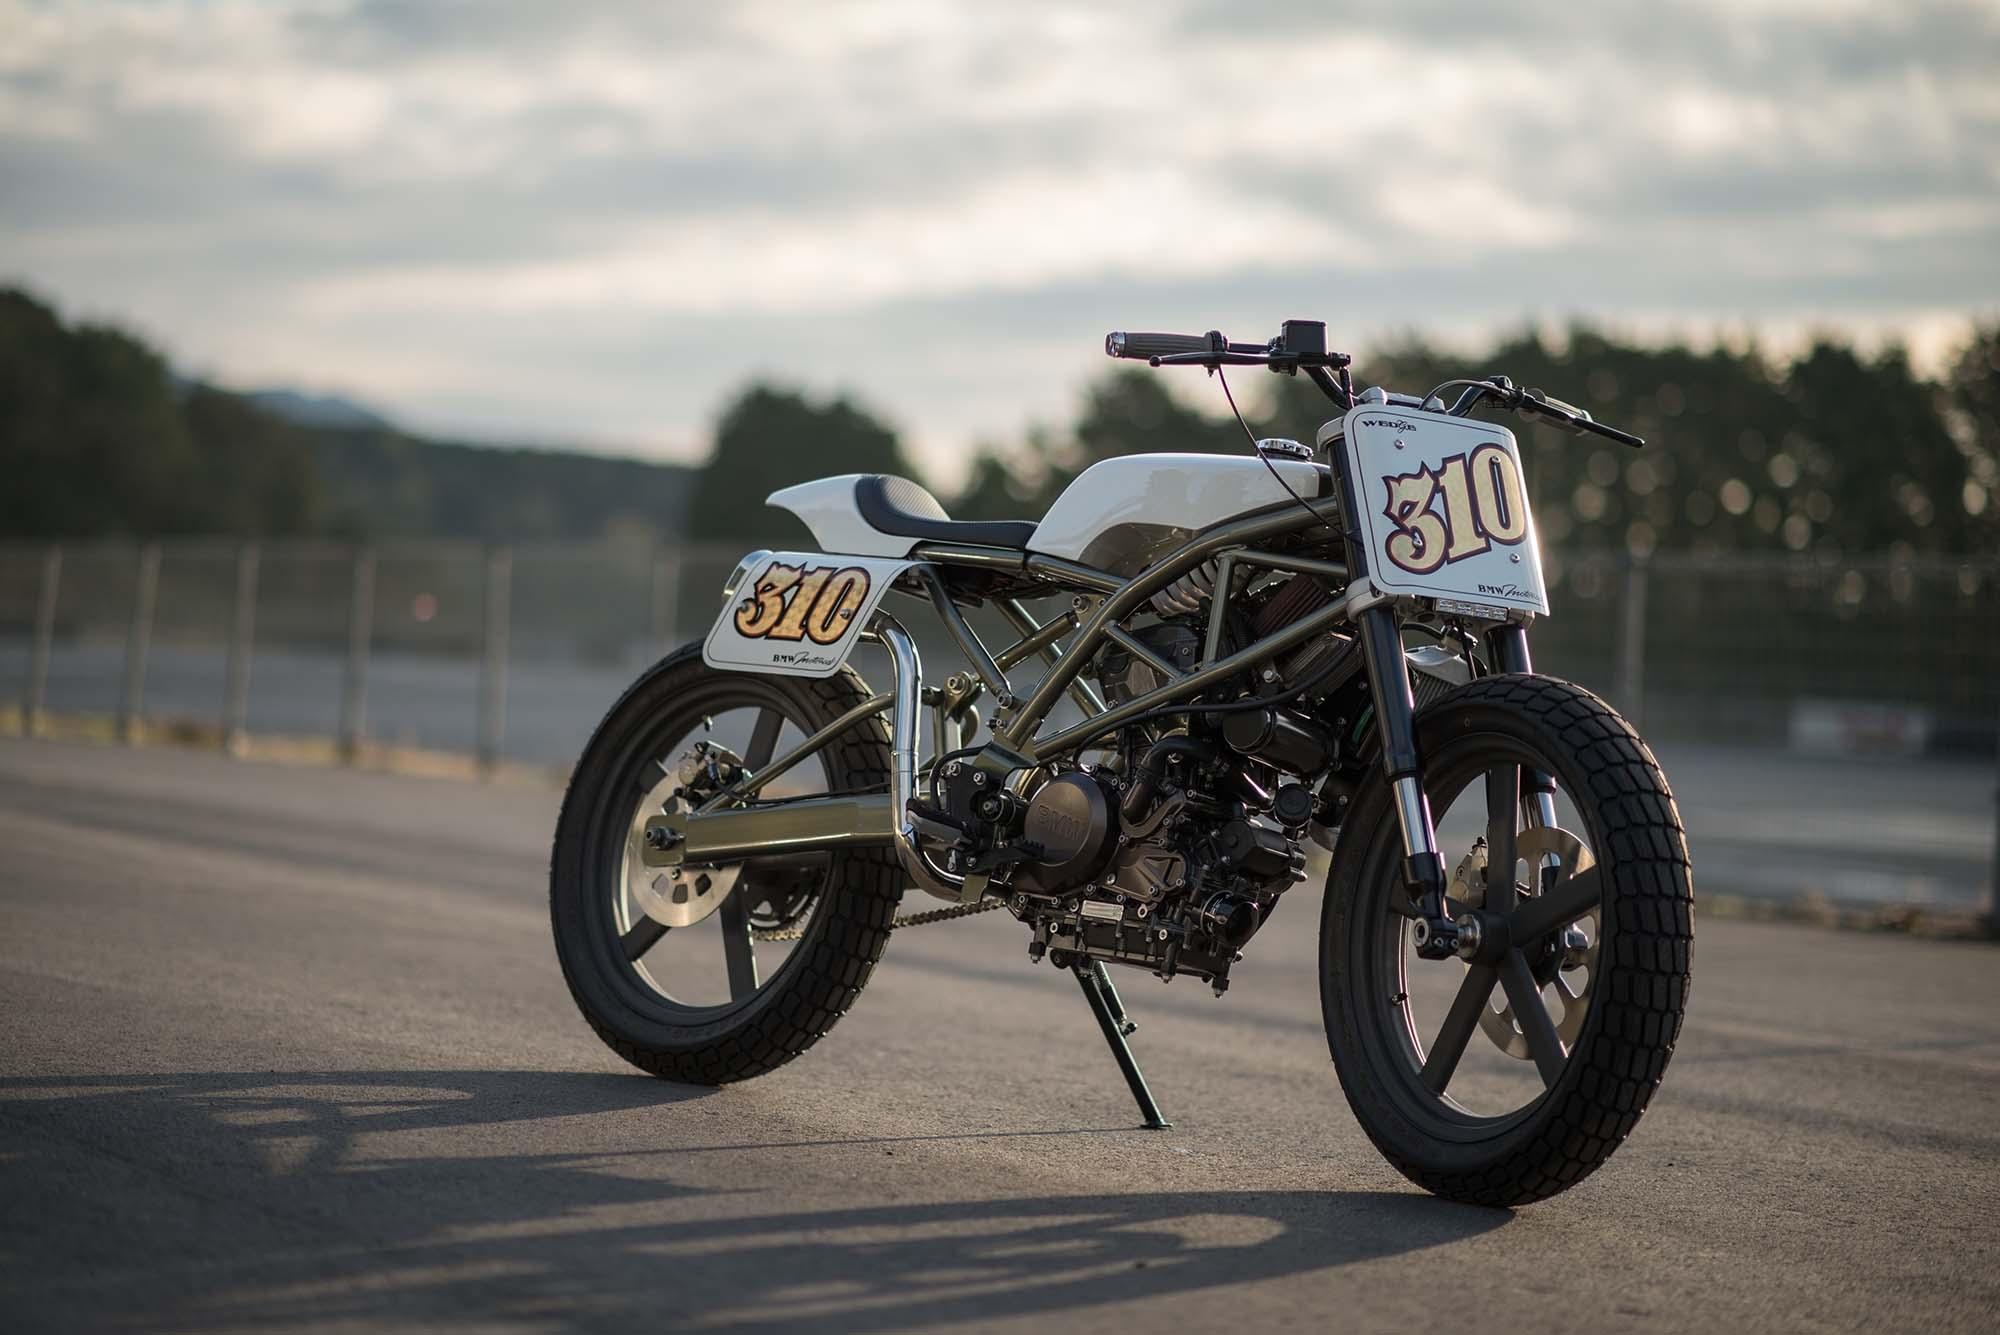 Gallery Custom Bmw G310 R Street Tracker By Wedge Motorcycles Bikesrepublic